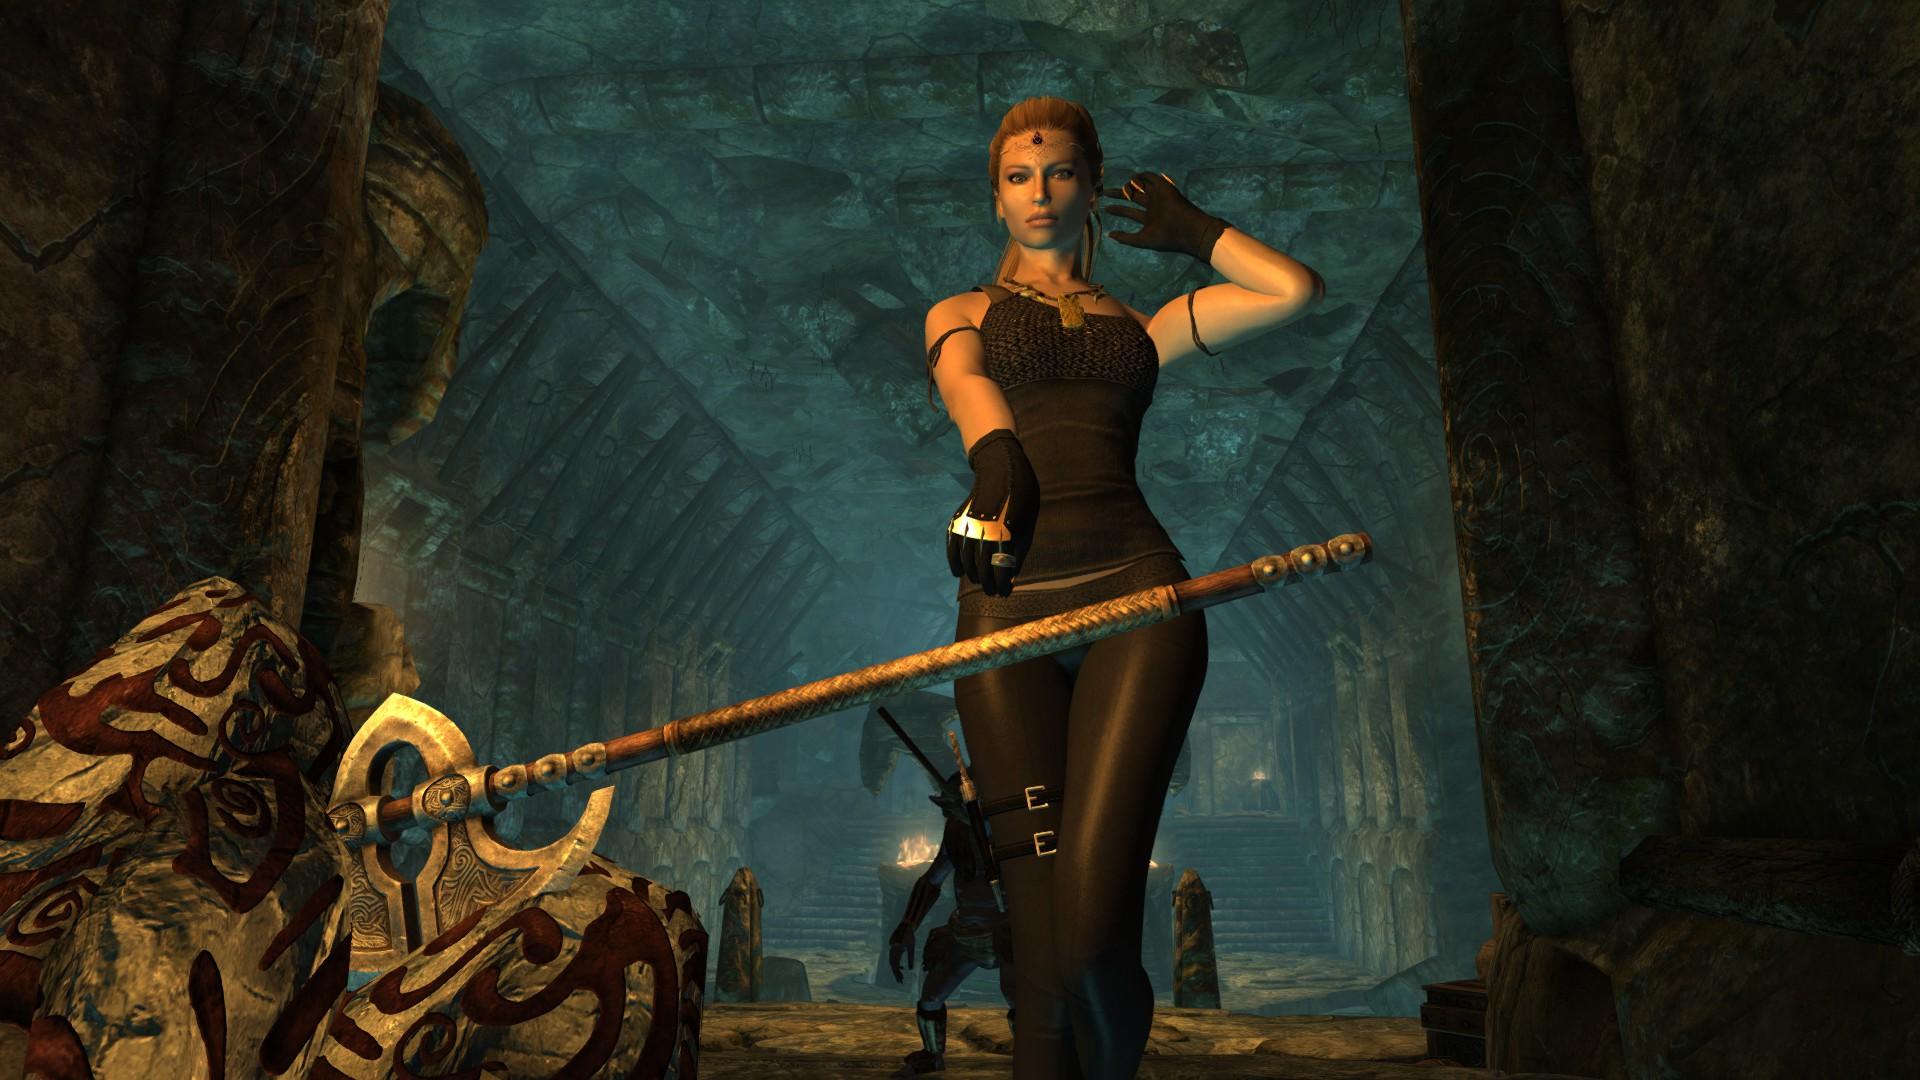 20180709033955_1.jpg - Elder Scrolls 5: Skyrim, the